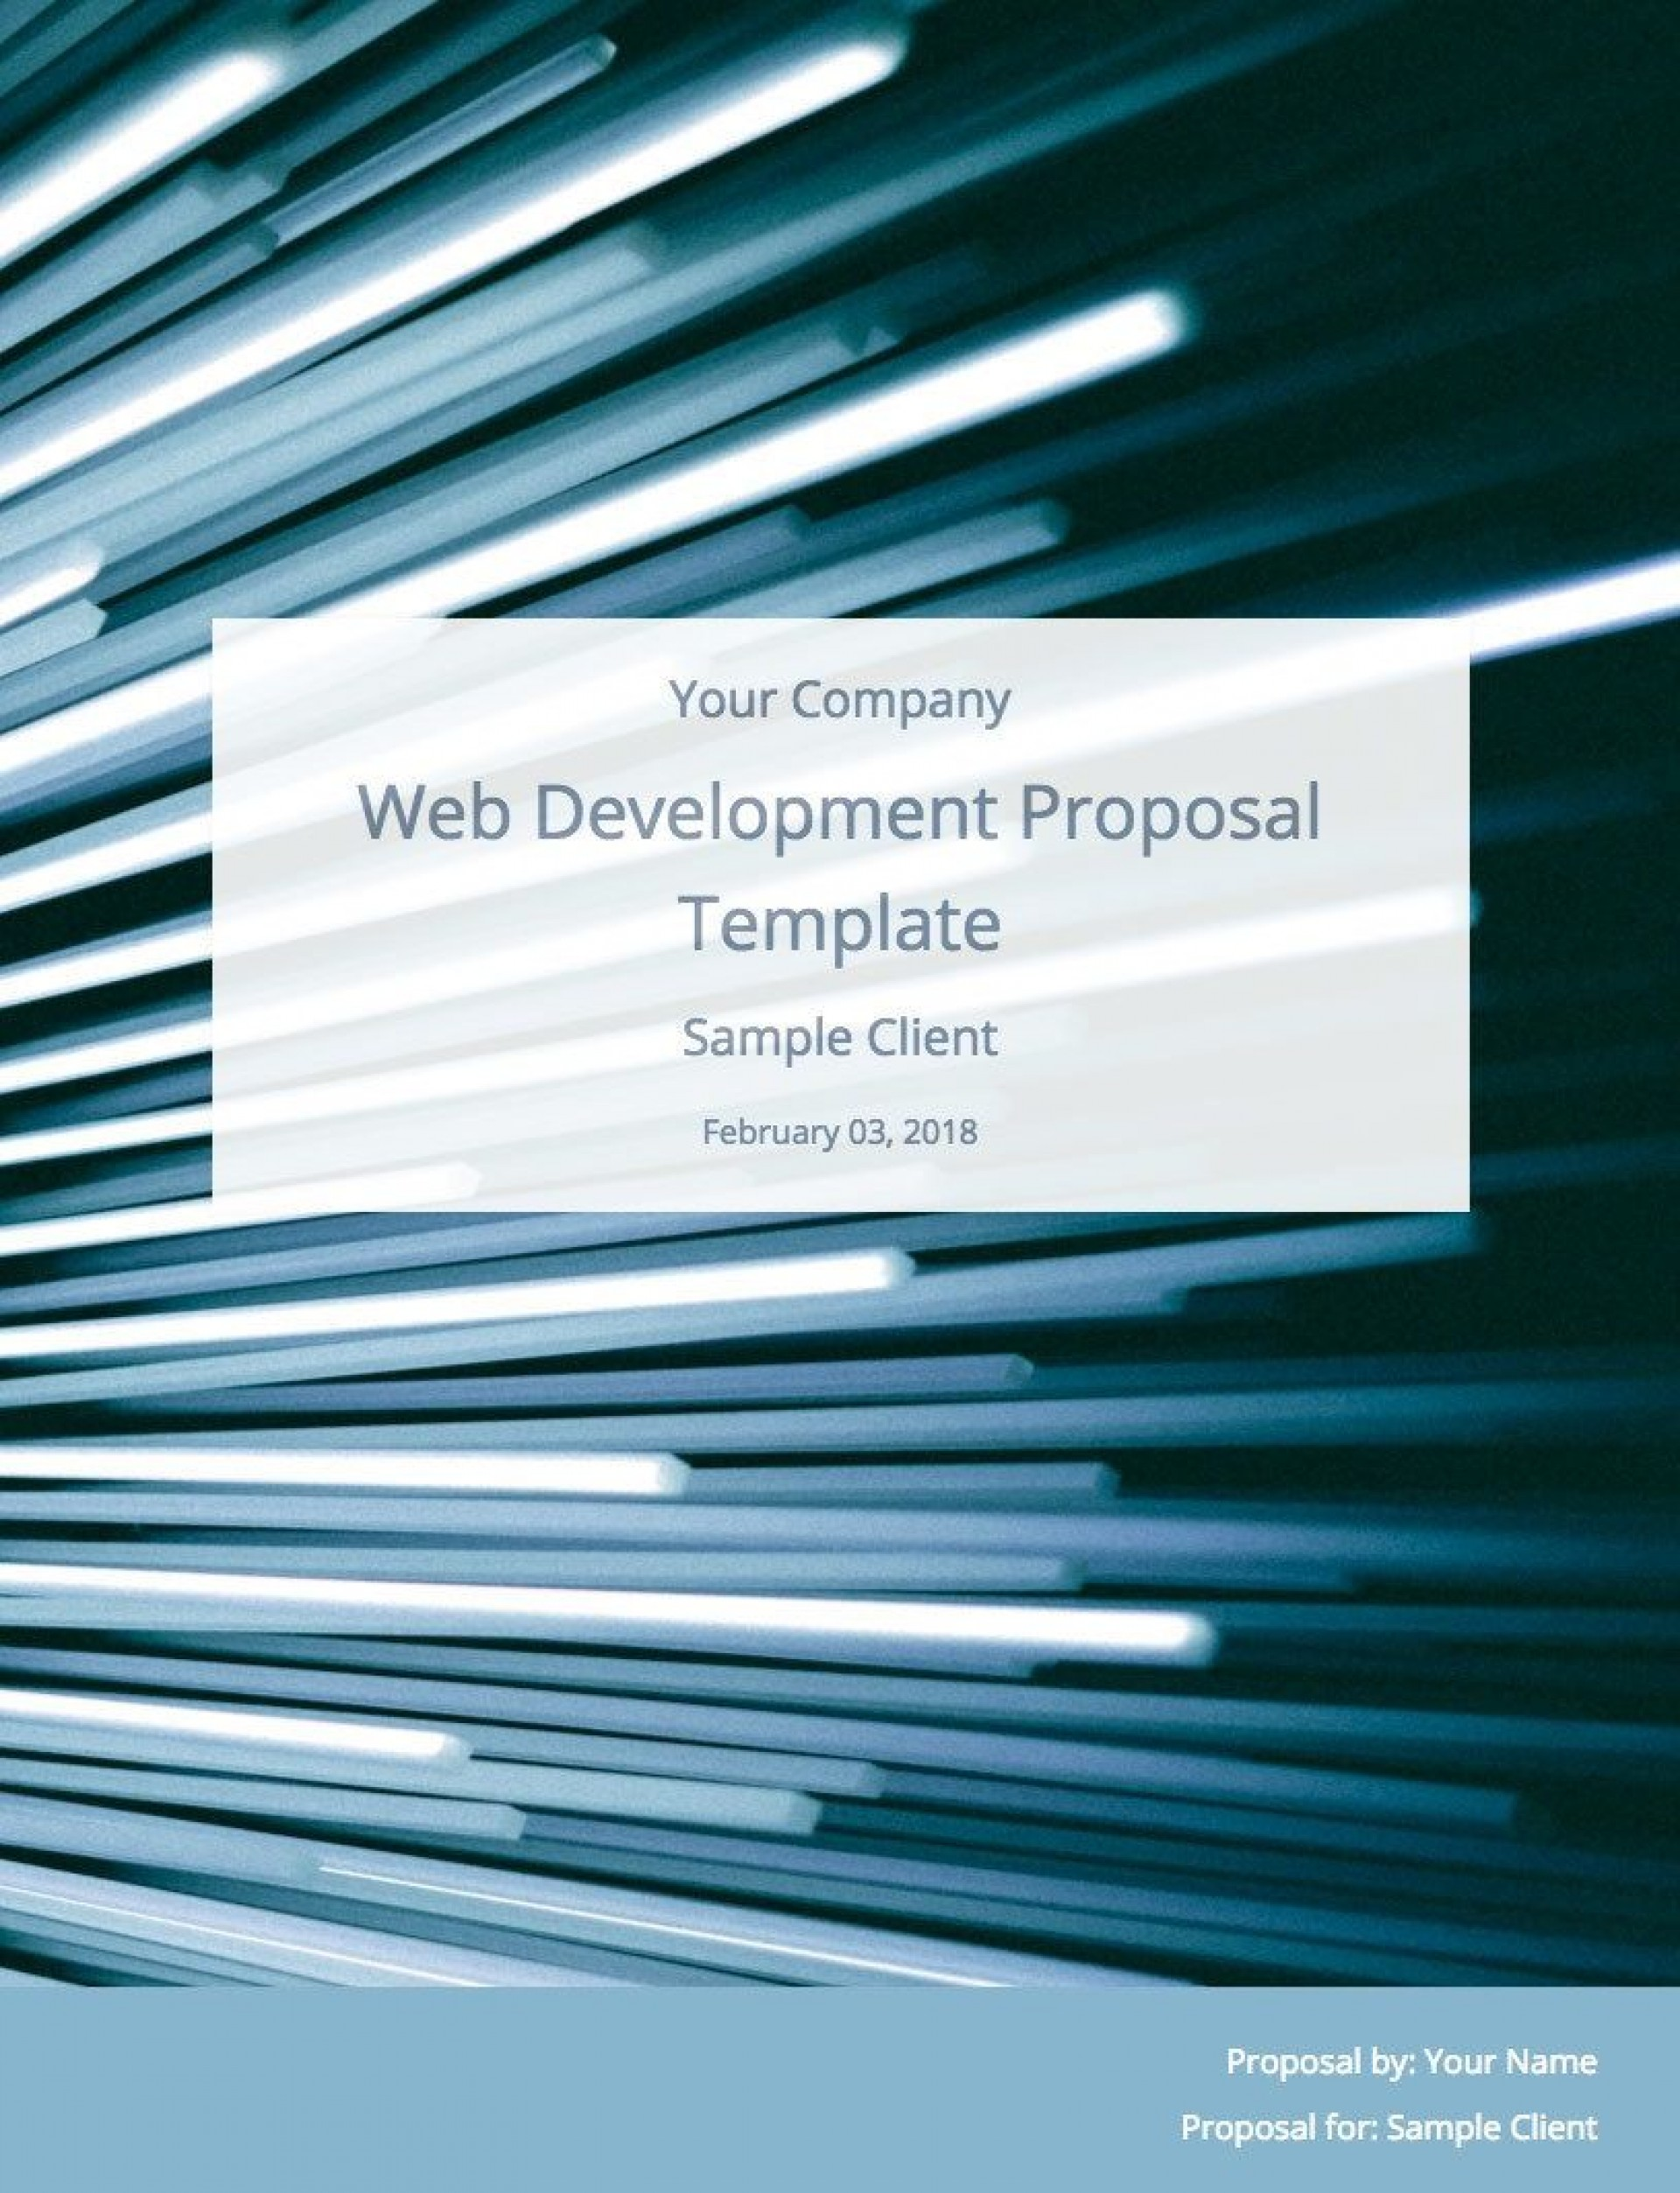 009 Impressive Website Development Proposal Template Free Design  Word1920